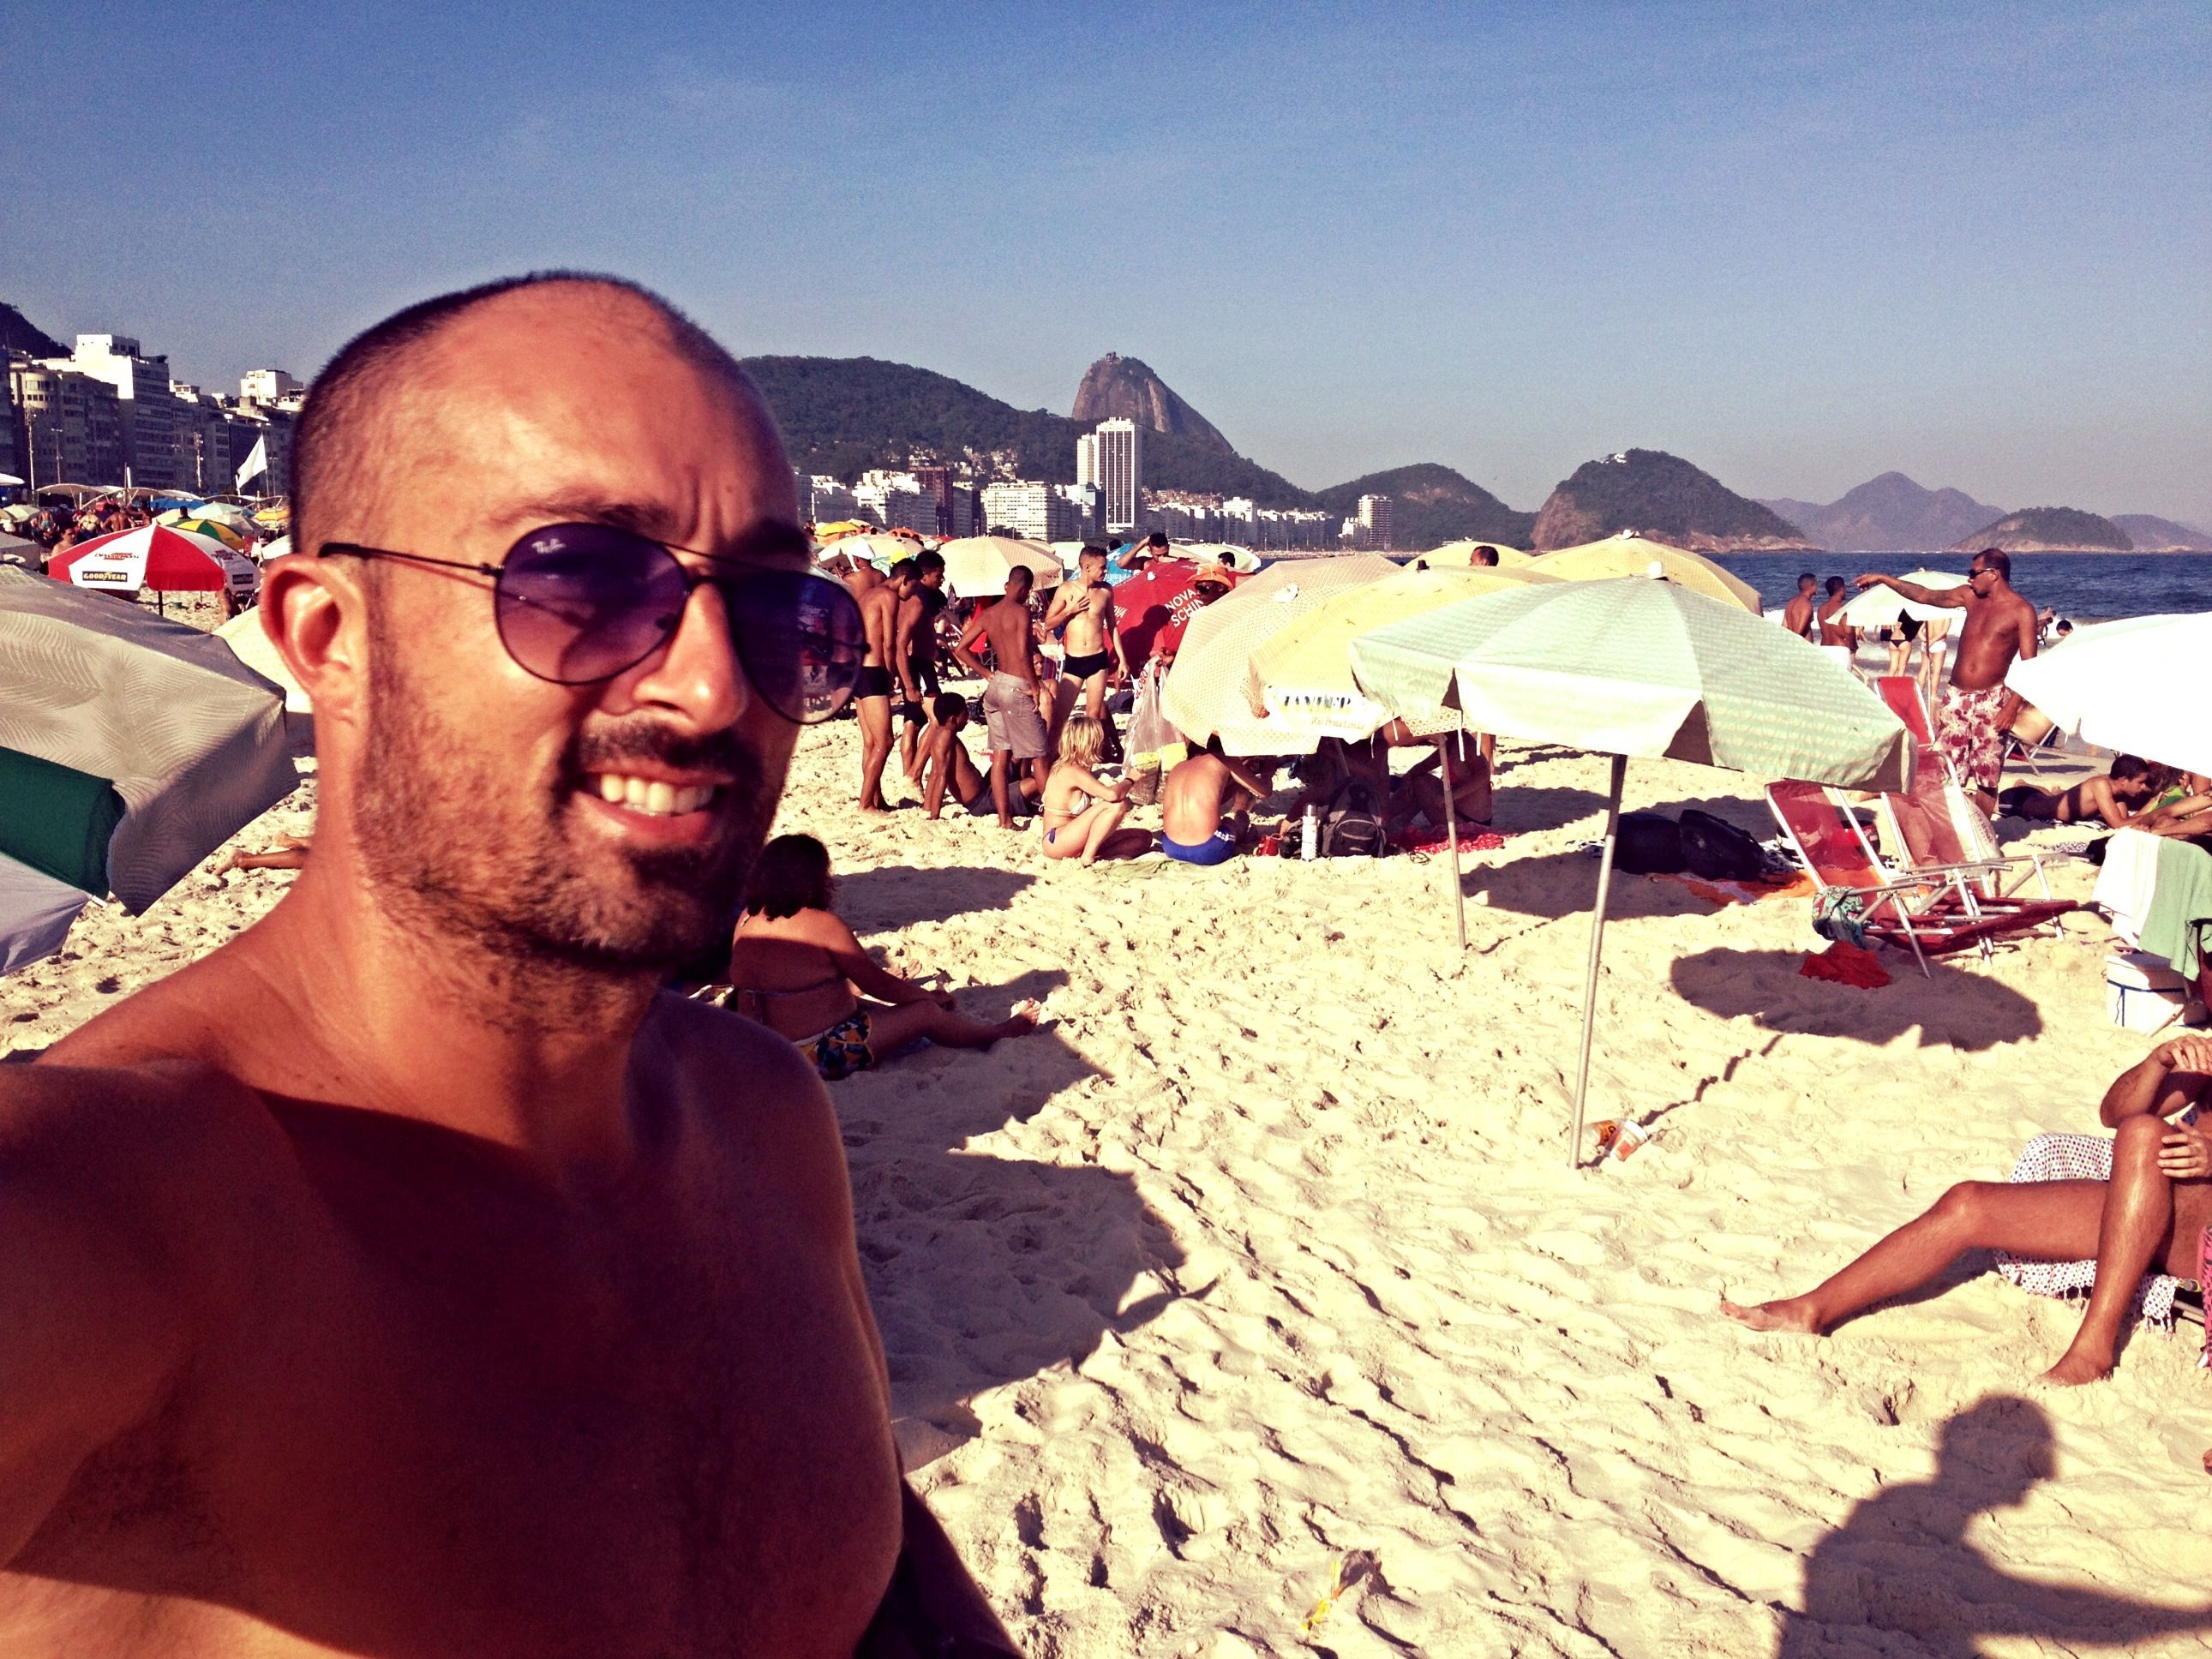 Yesterday was another holiday in Brazil. What does your midweek look like?  Ontem foi mais um feriado no Brasil. Qual é o seu meio de semana se parece? #brazil #rio #beach #paradise #youshouldbehere #ysbh